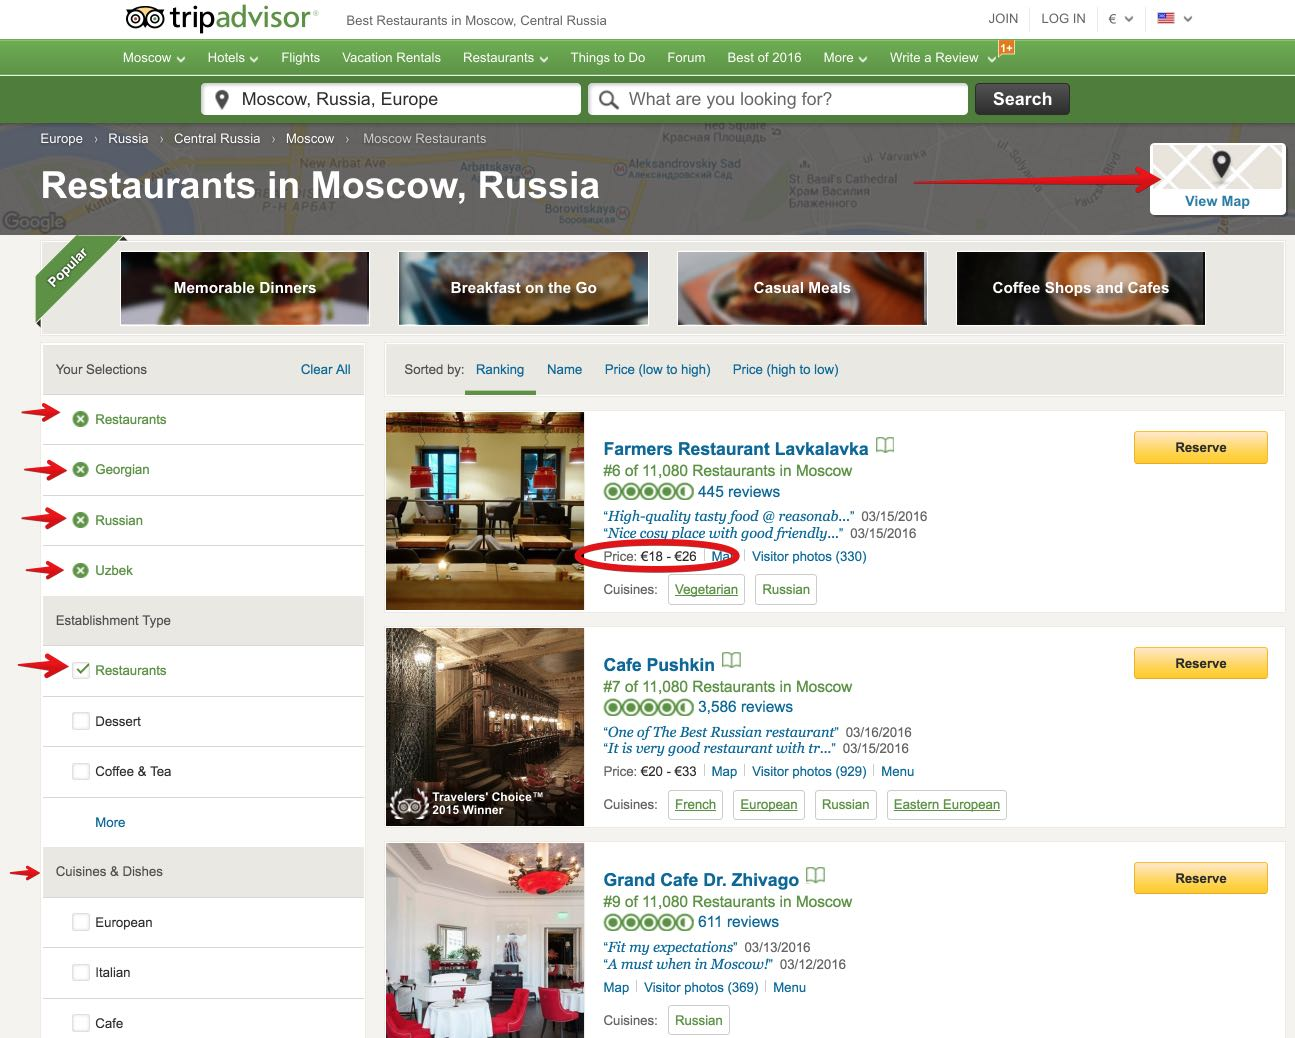 Les meilleurs restaurants à Moscou - Tripadvisor